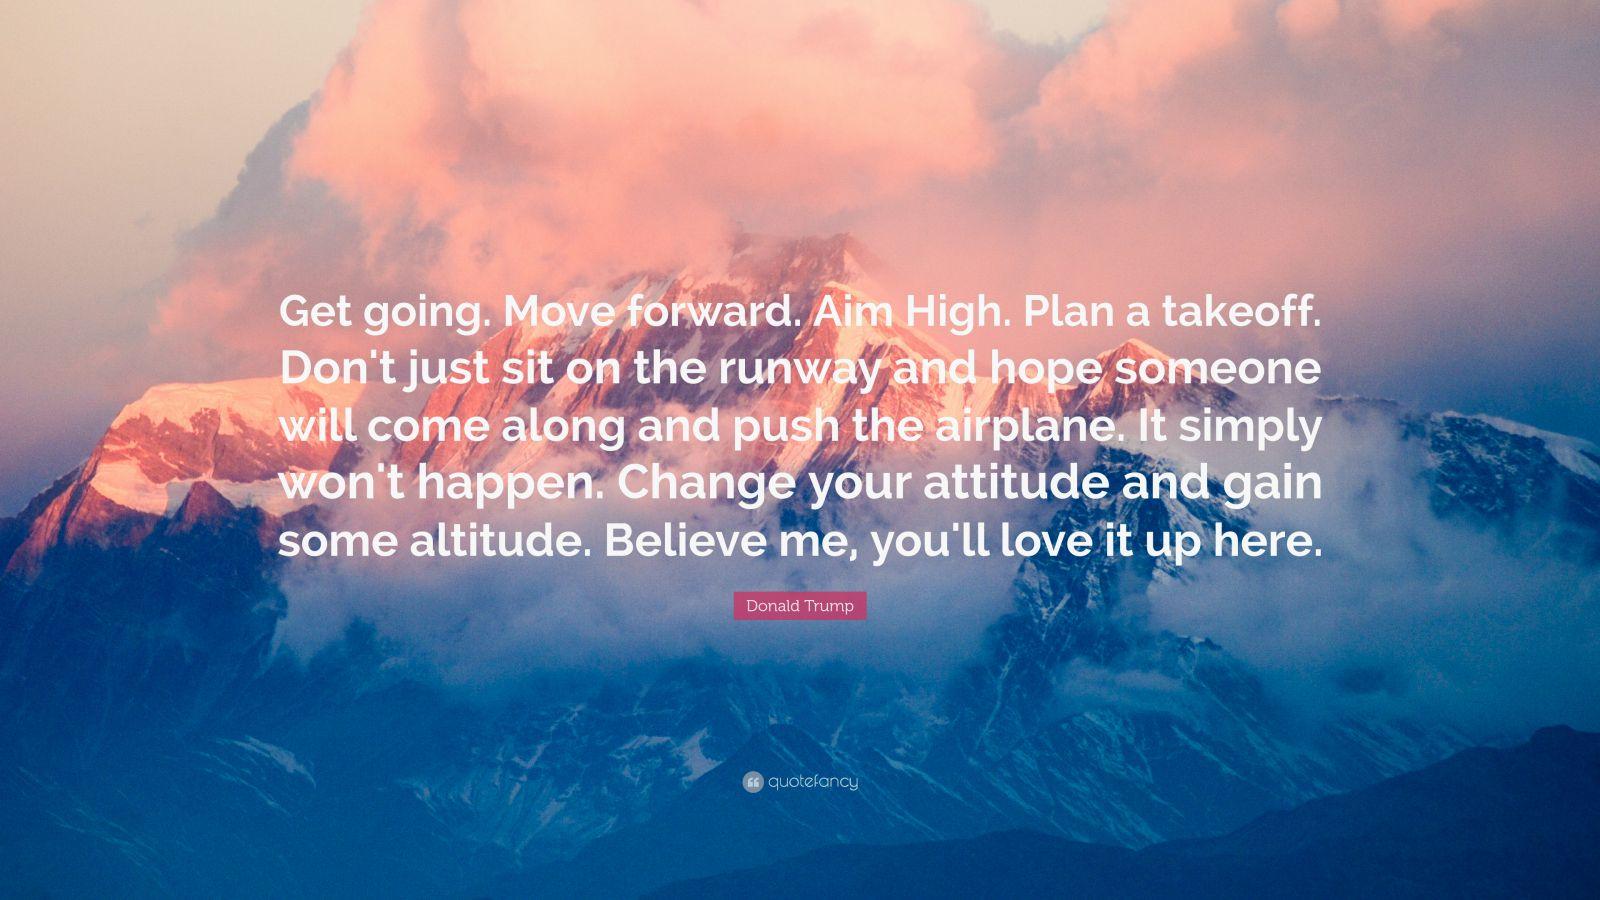 Donald Trump Quote Wallpaper Donald Trump Quote Get Going Move Forward Aim High